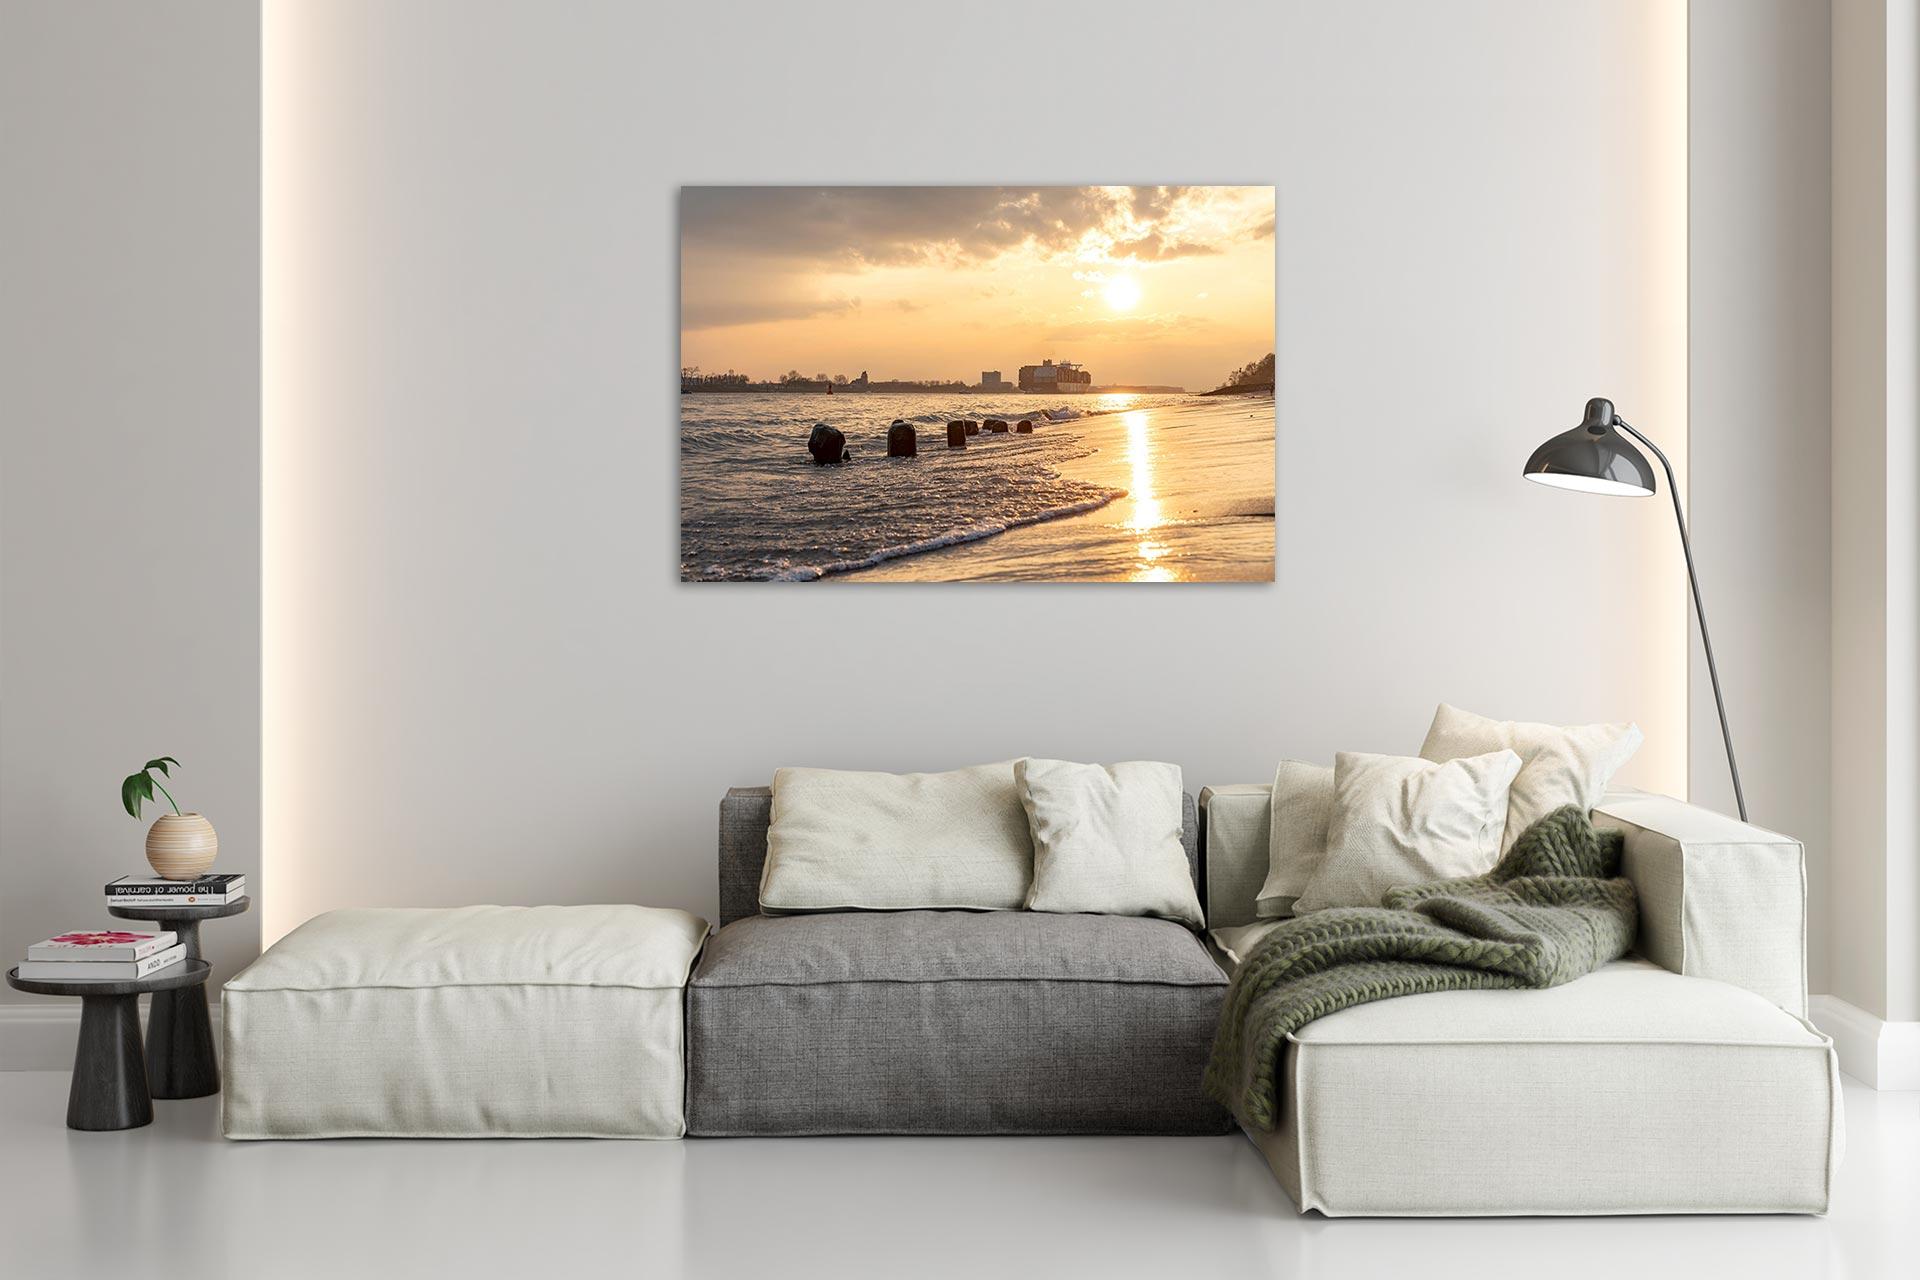 NL084-sommerabend-elbe-hamburg-wandbild-bild-auf-leinwand-acrylglas-aludibond-wohnzimmer